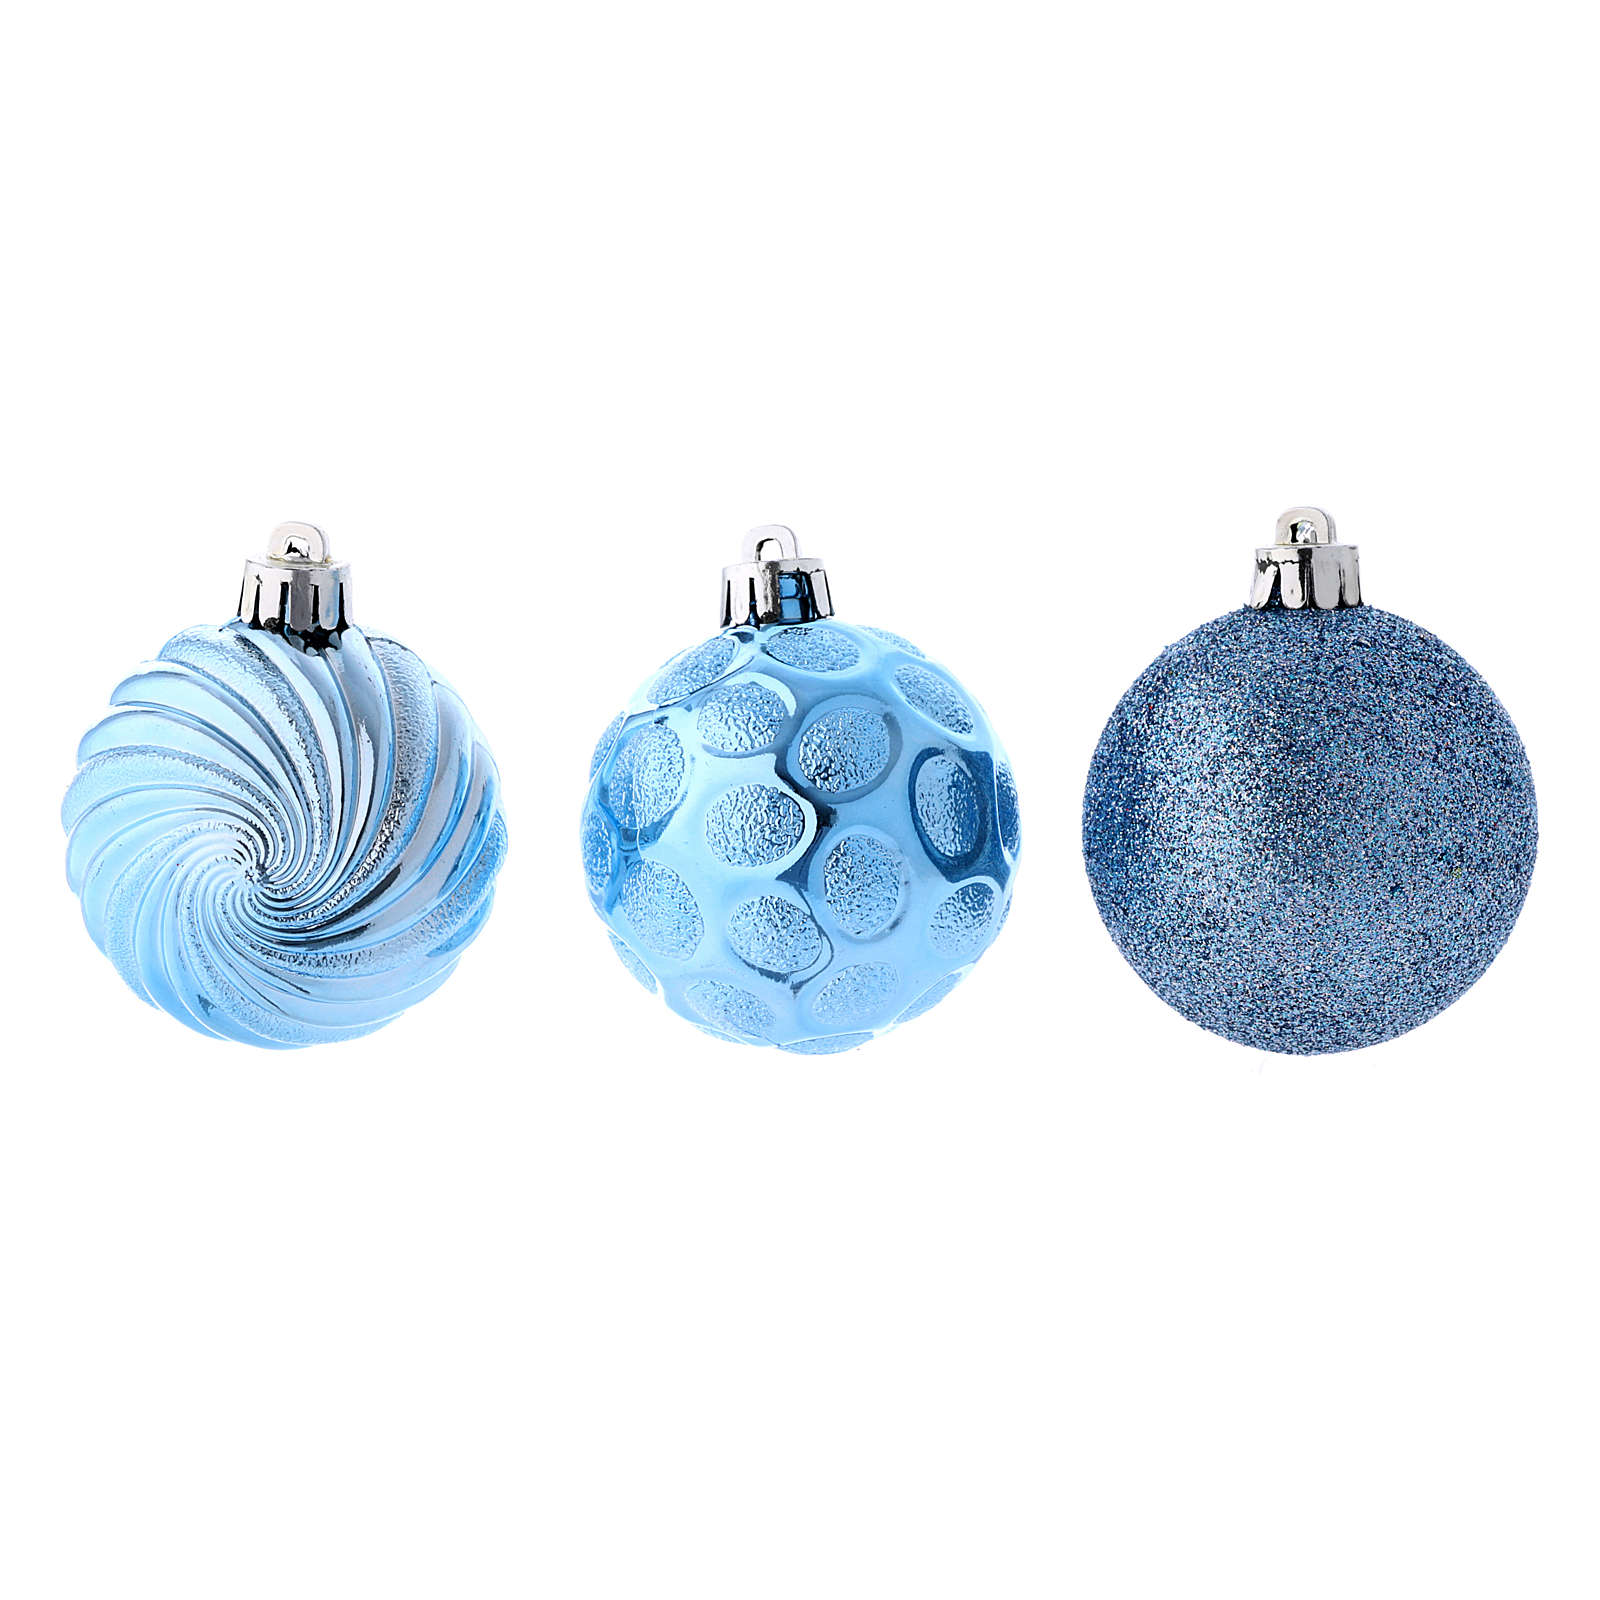 Pallina Natale 12 pz (confezione) color celeste 60 mm 4